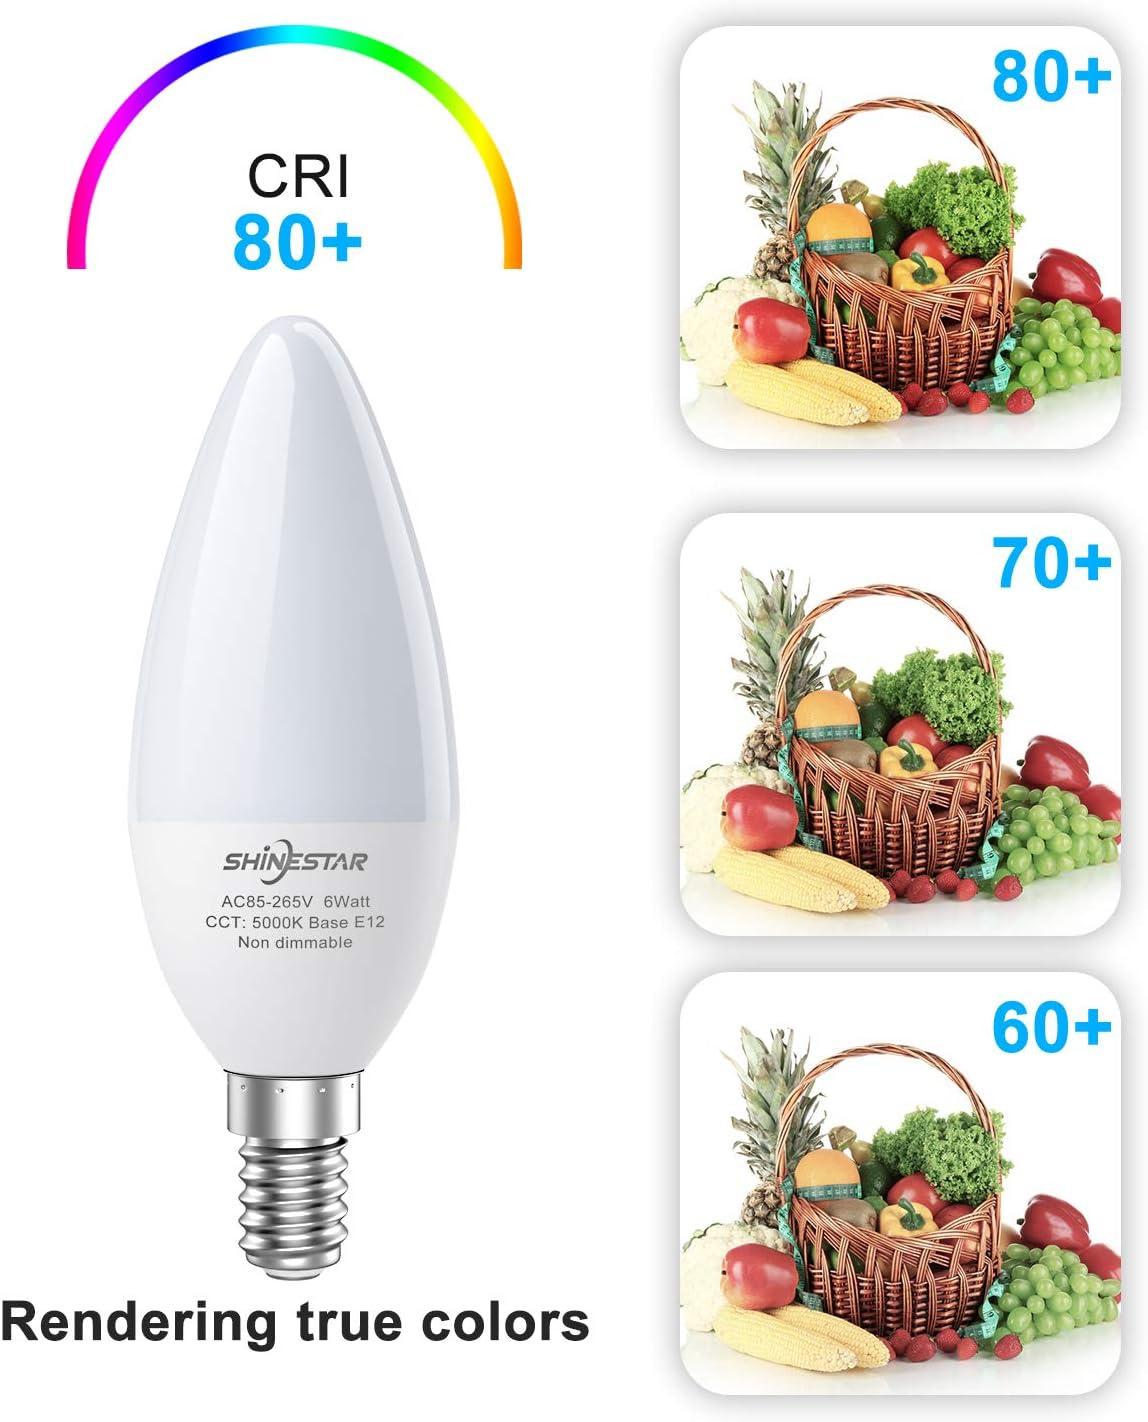 Ceiling Fan Light Bulbs 60W Equivalent Non-dimmable 8-Pack E12 LED Bulbs 2700K Warm White Candelabra LED Bulb Chandelier Bulb Type B Small Base